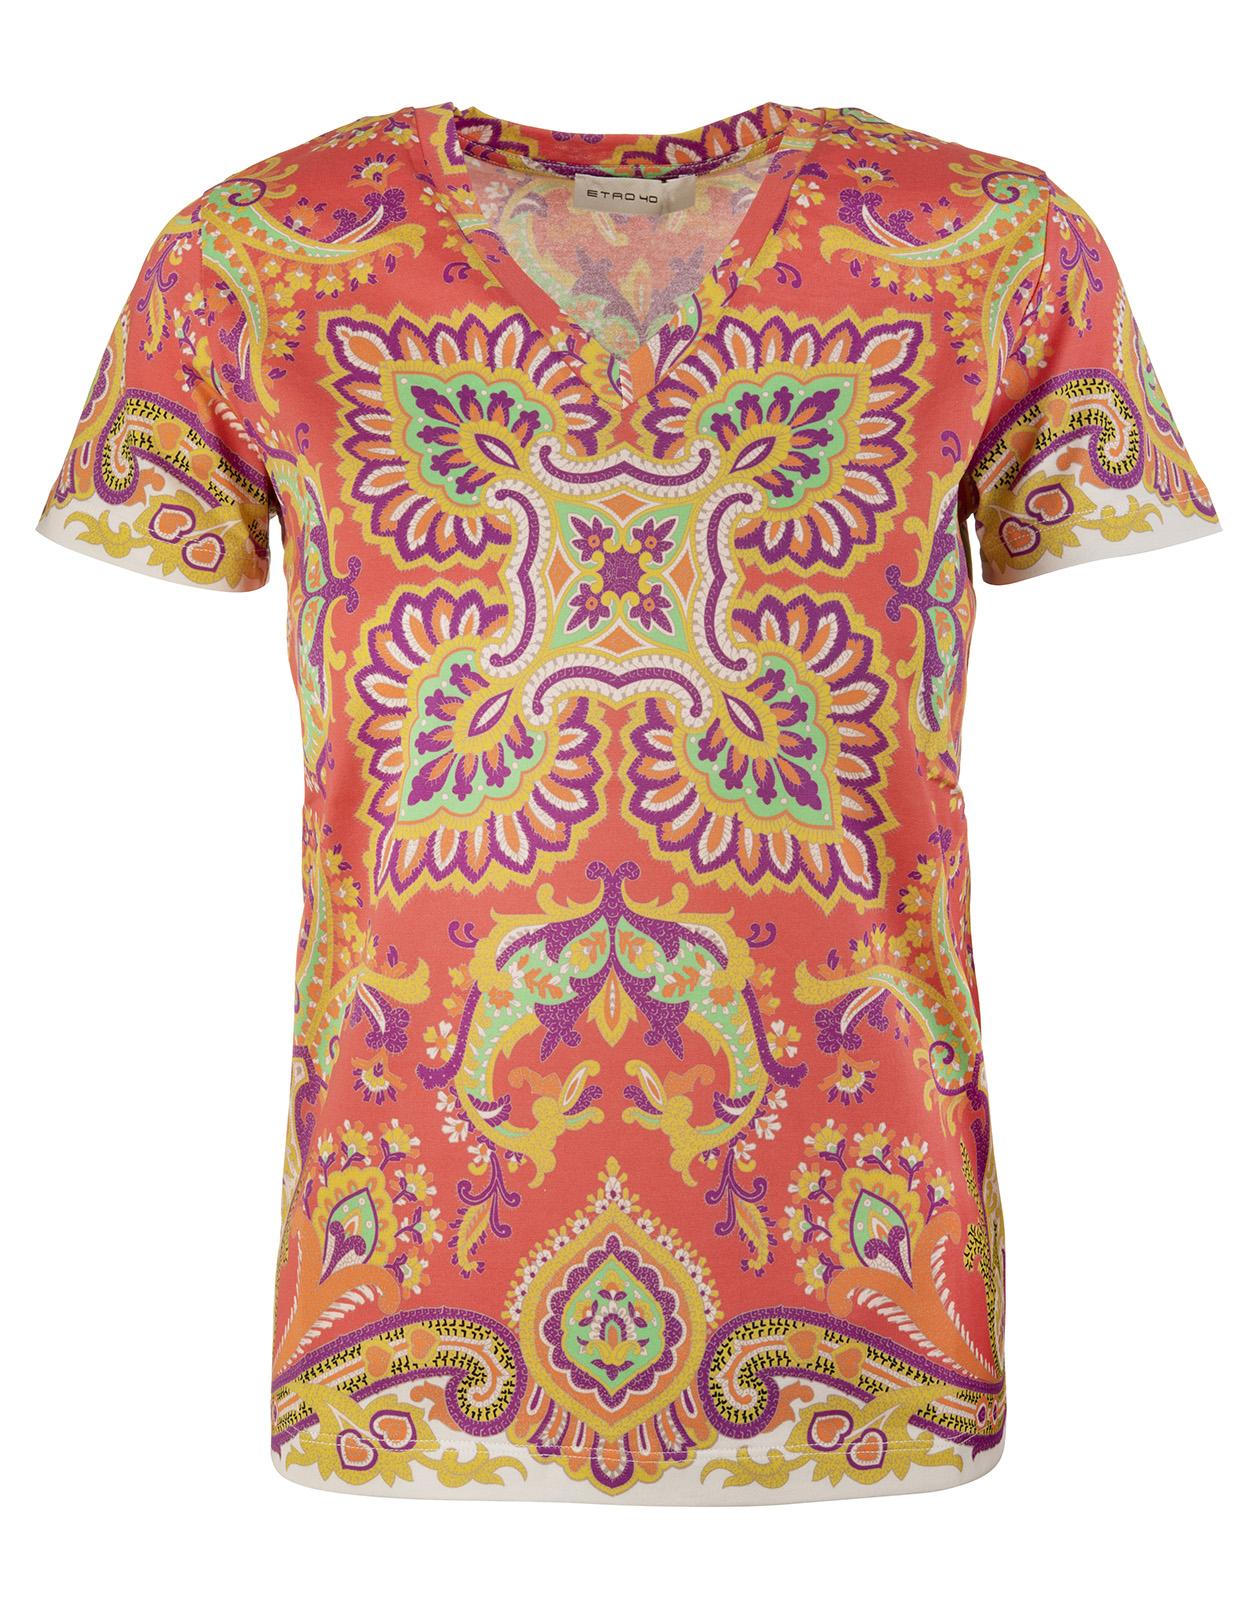 64c17f3695bf0 Fantasy Print T-shirt - ETRO - Russocapri